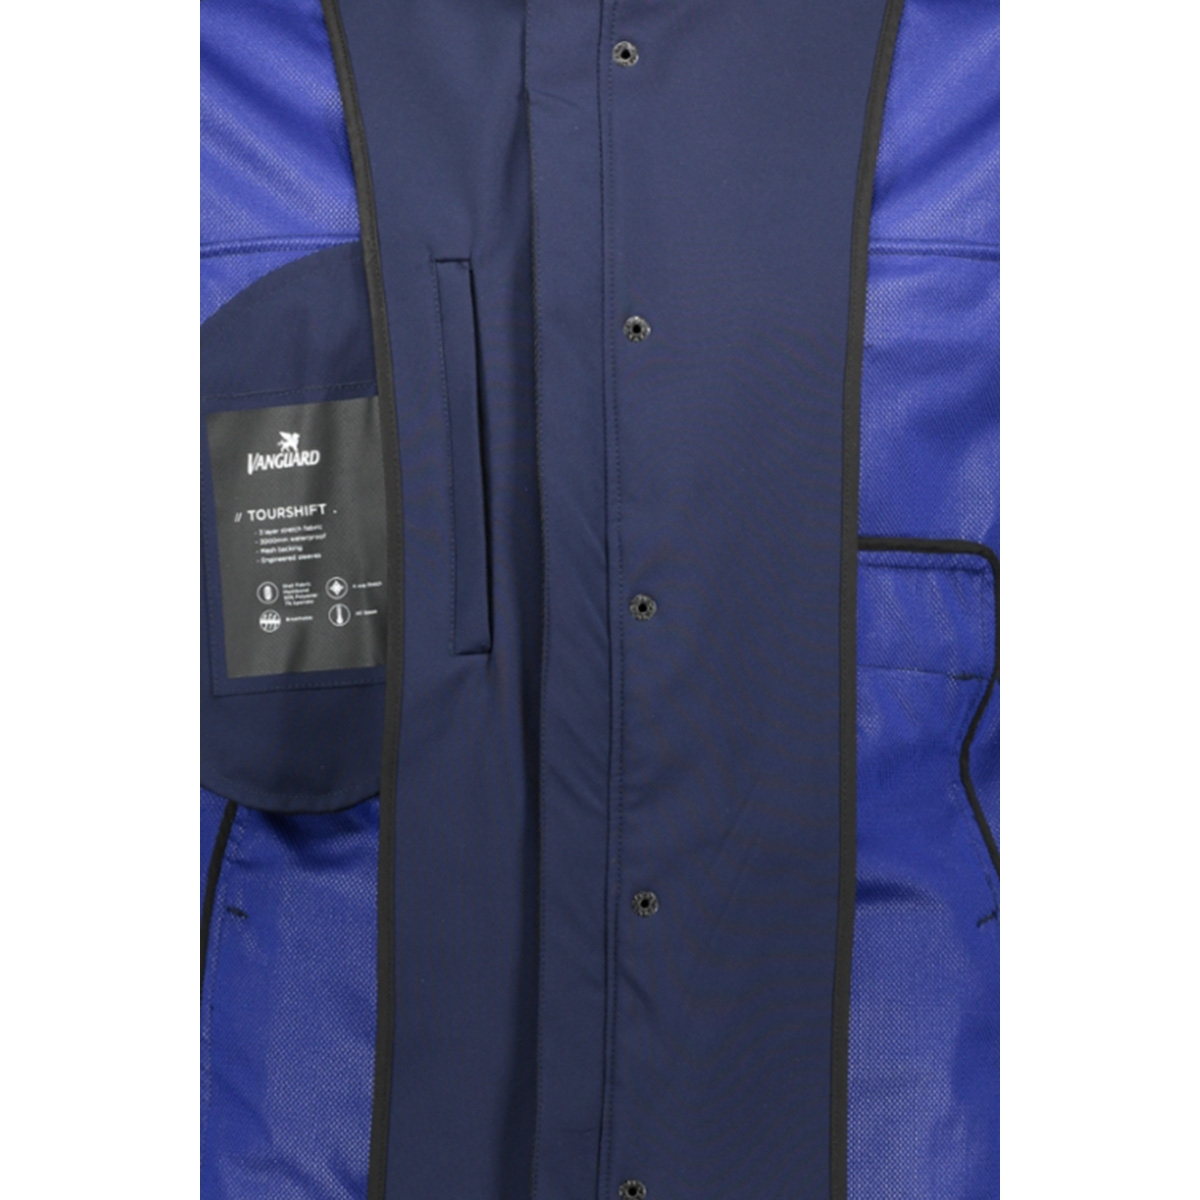 tourshift jacket vja201106 vanguard jas 5286